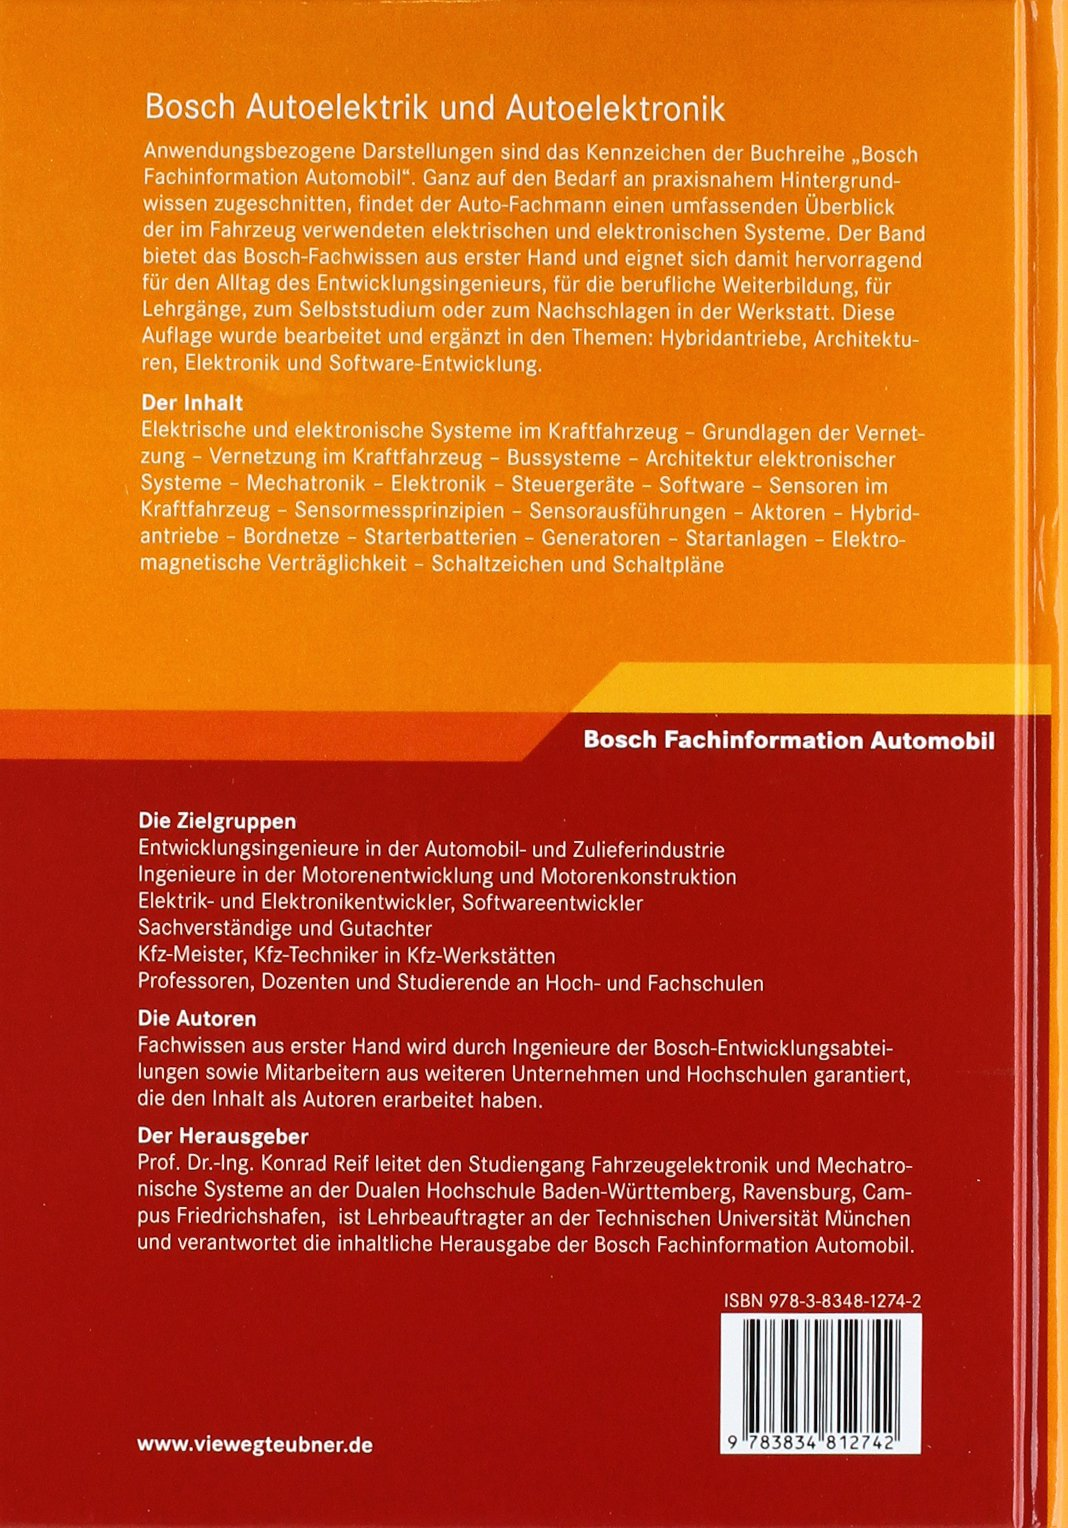 Groß Kfz Bordnetze Ideen - Schaltplan Serie Circuit Collection ...